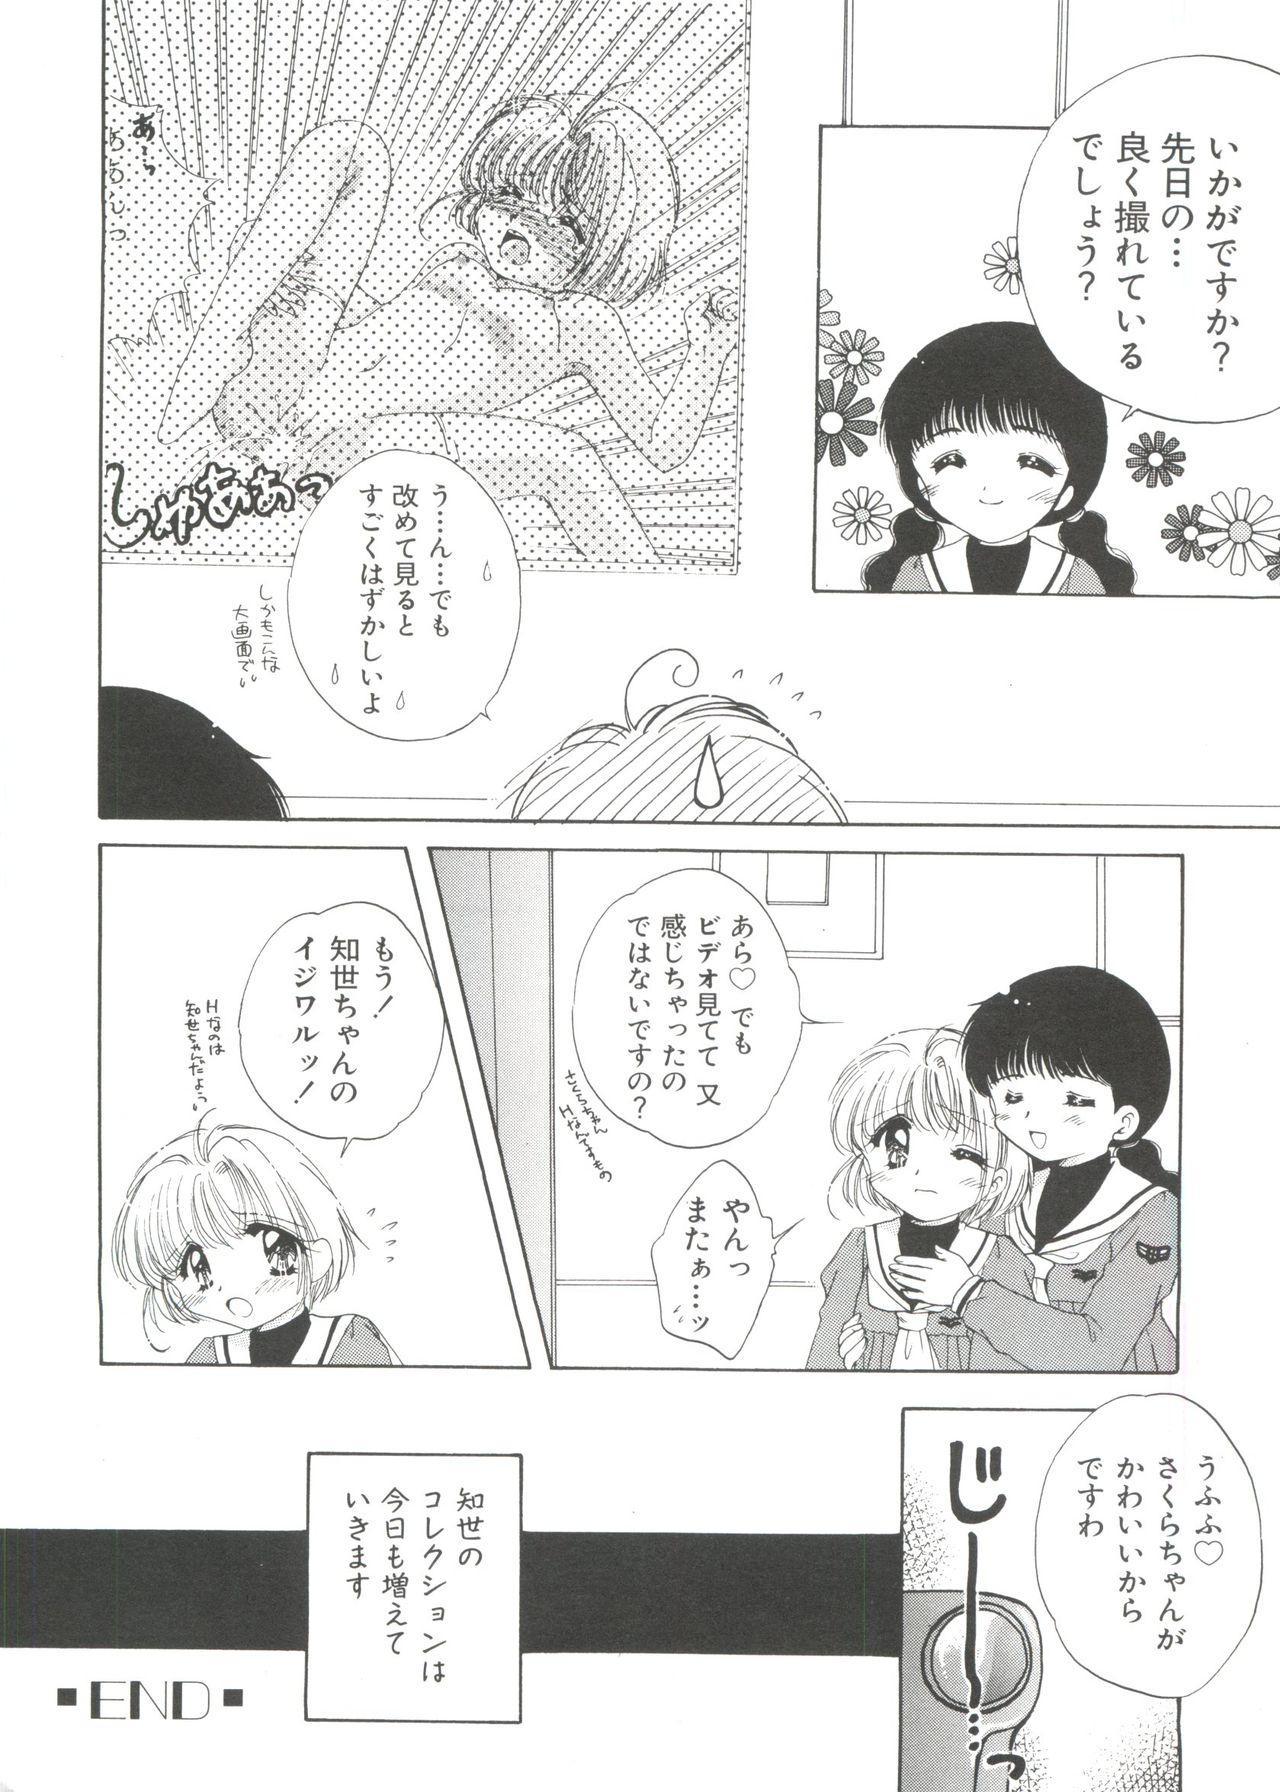 Ero-chan to Issho 3 129